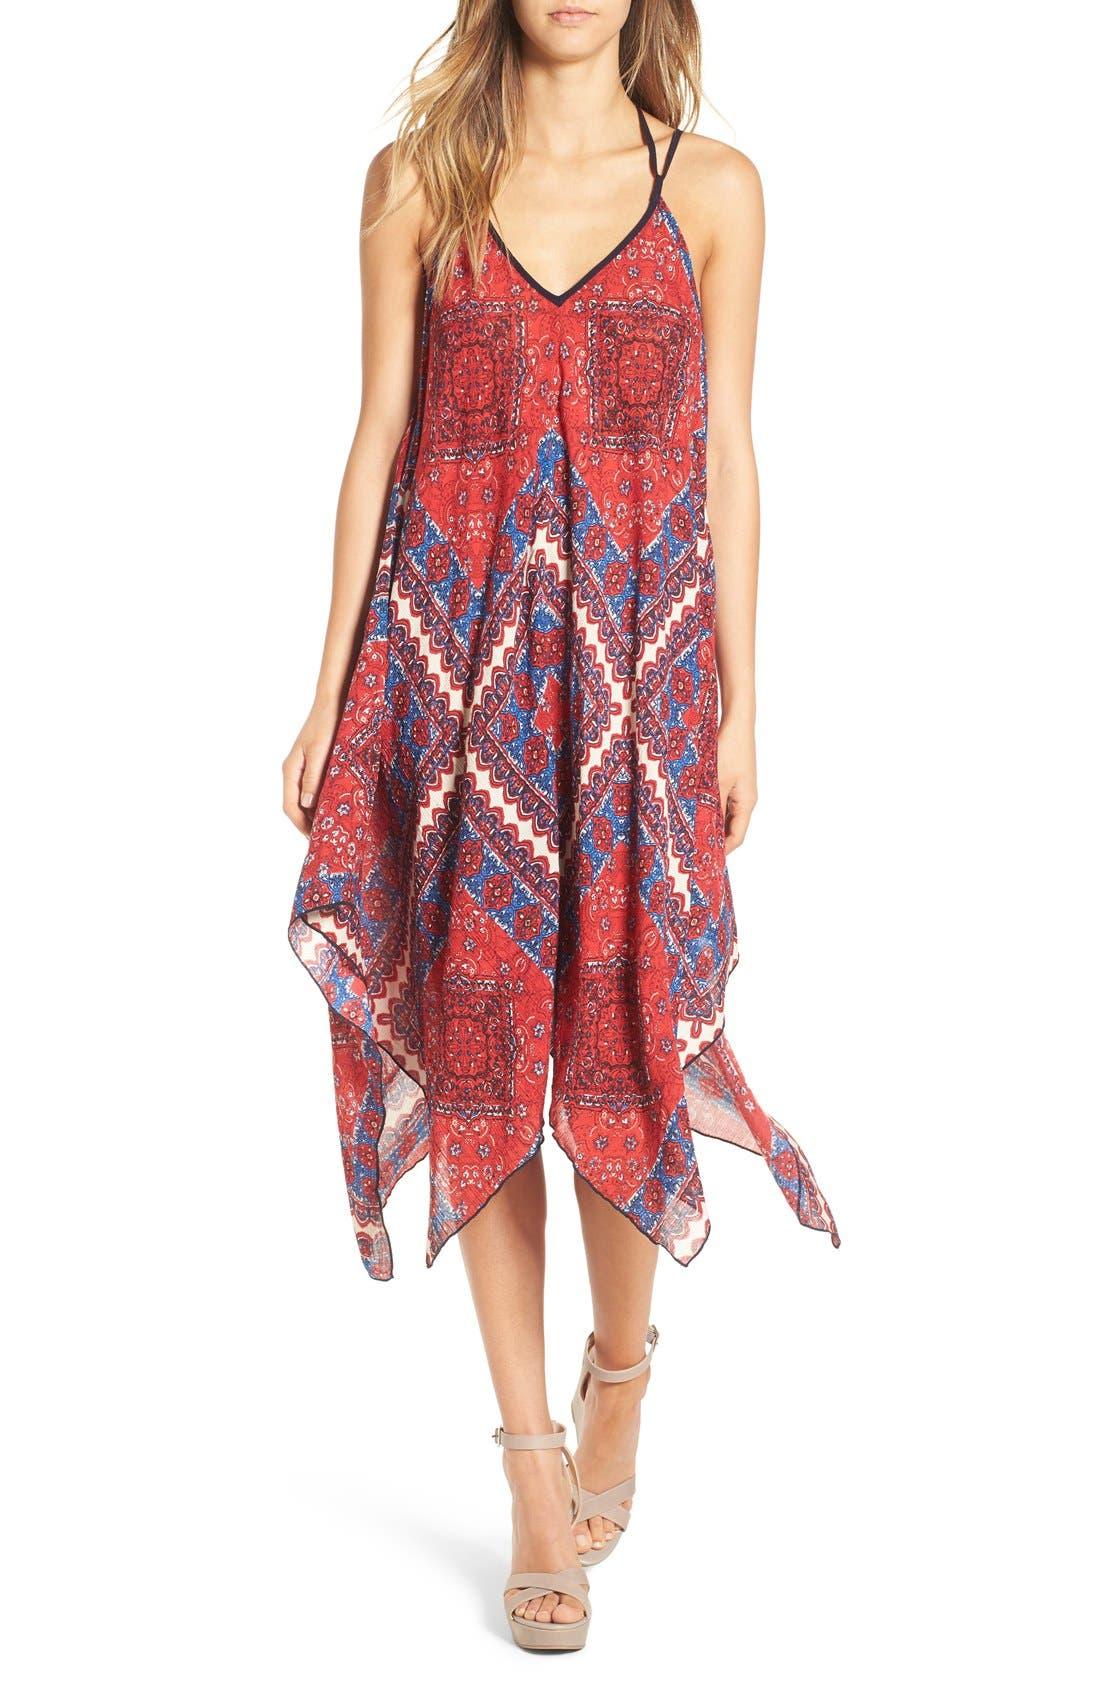 Main Image - Band of Gypsies Scarf Print Handkerchief Hem Dress